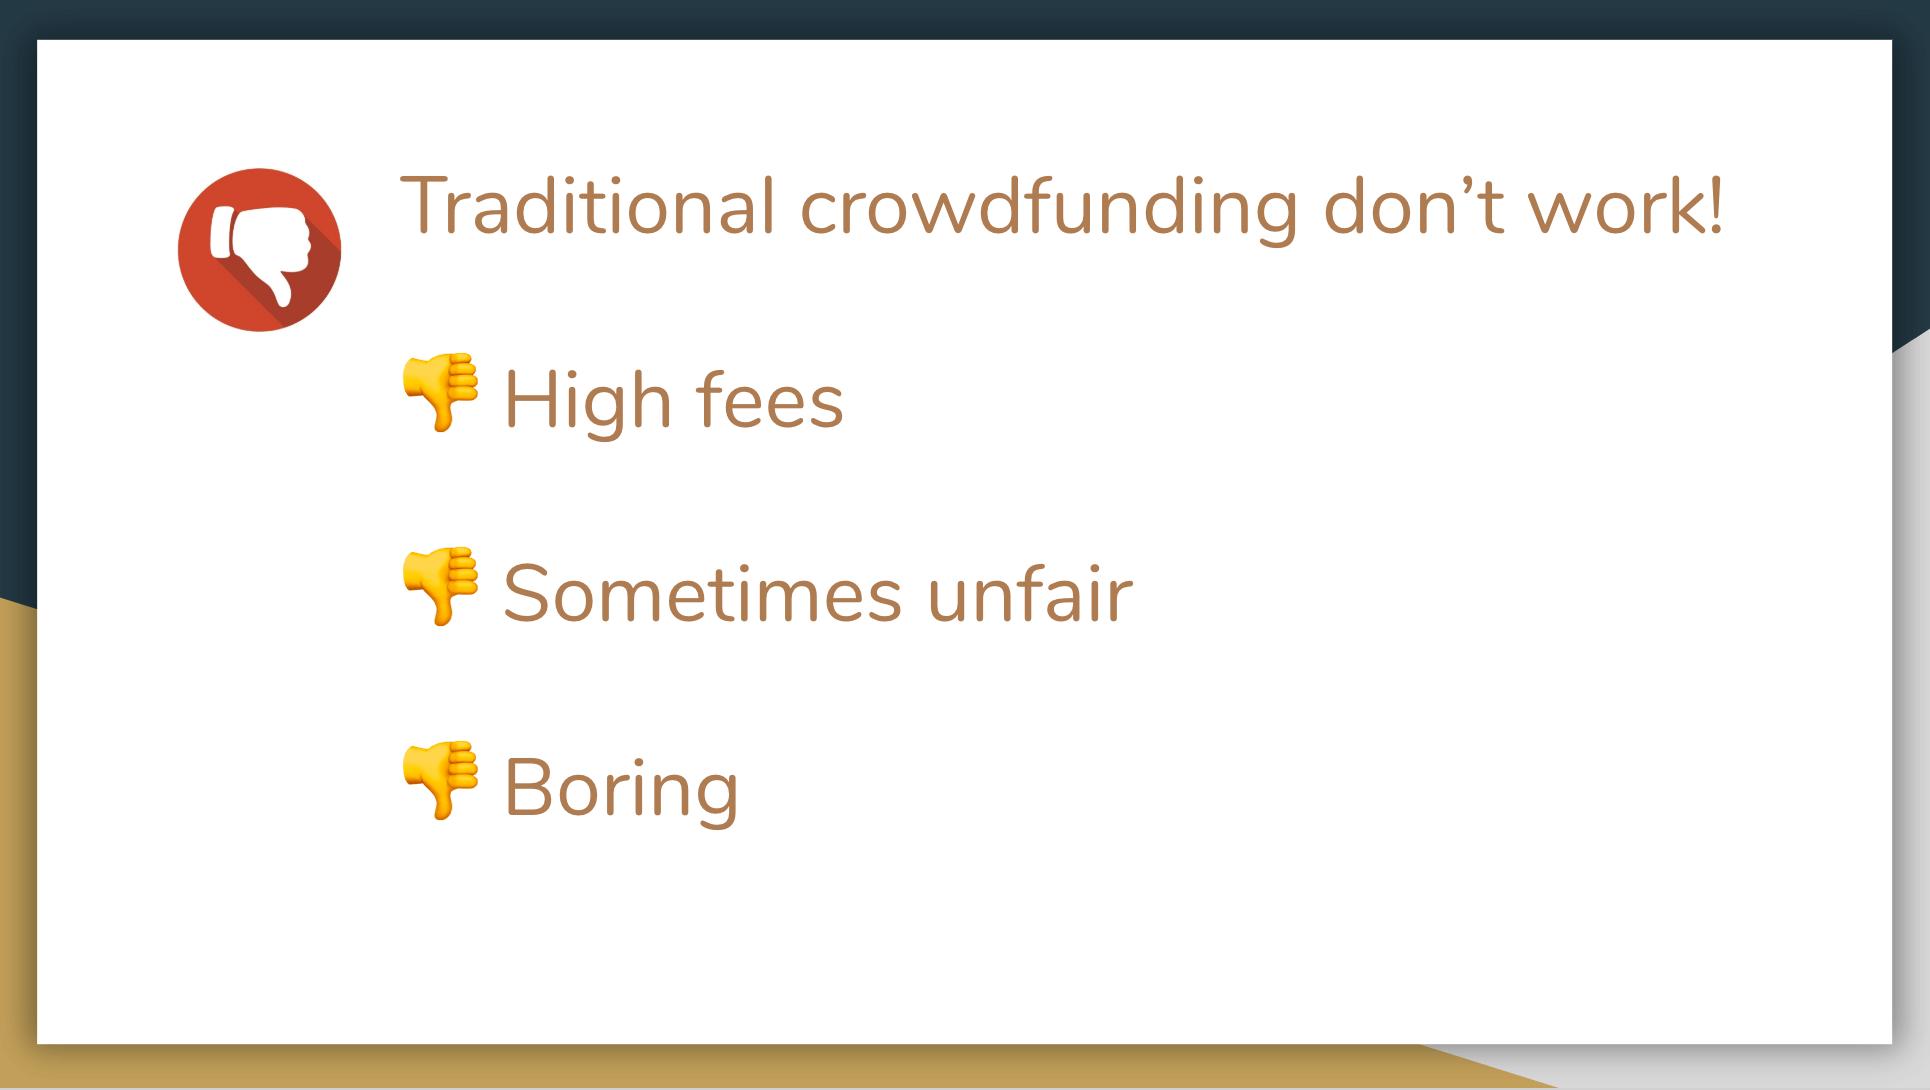 Crowdfunding is boring